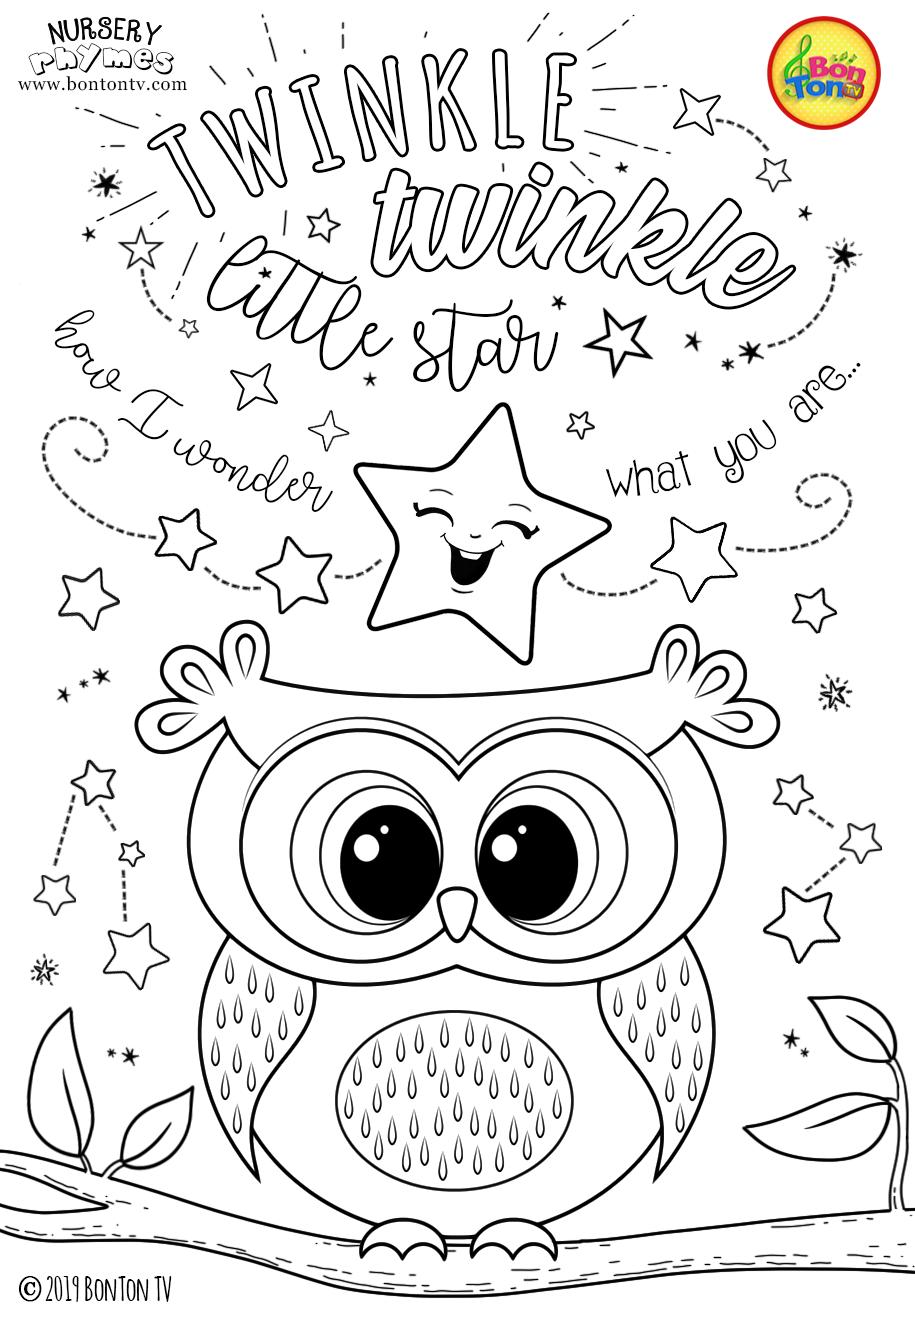 Nursery Rhymes Coloring Pages Free Preschool Printables For Kids Twinkle Twinkle Little Sta Owl Coloring Pages Unicorn Coloring Pages Kids Coloring Books